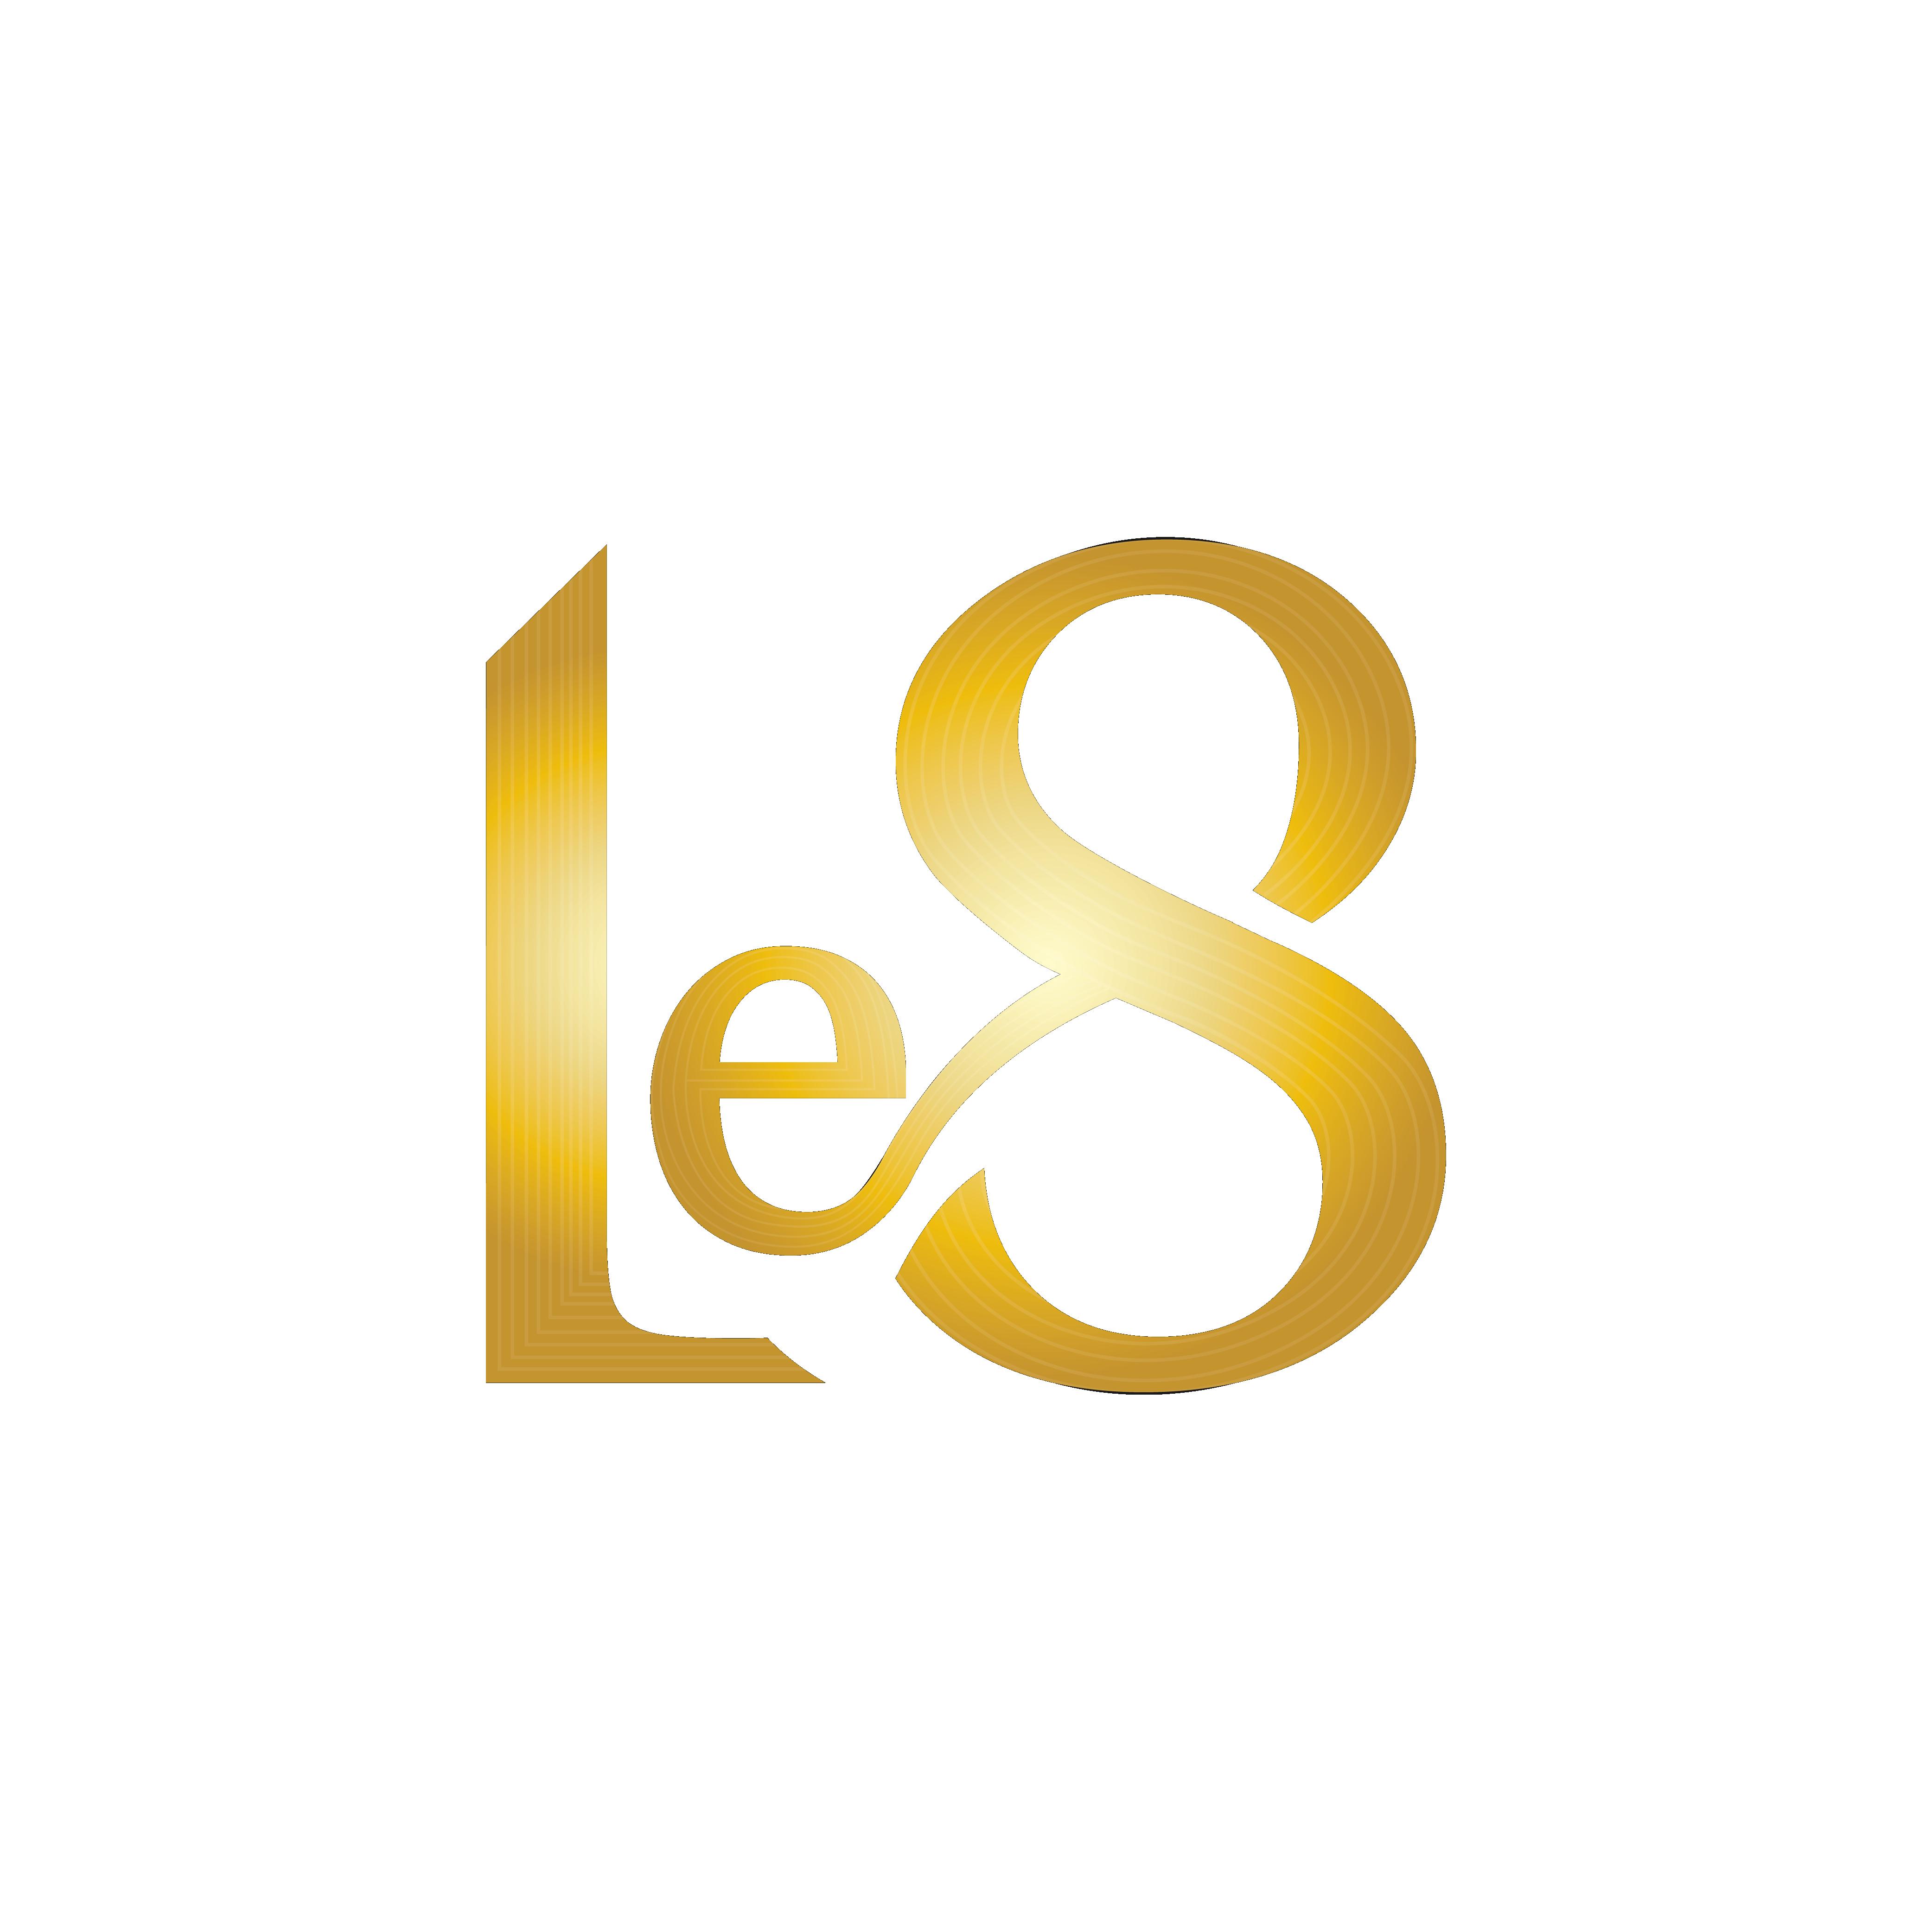 Logo Le8